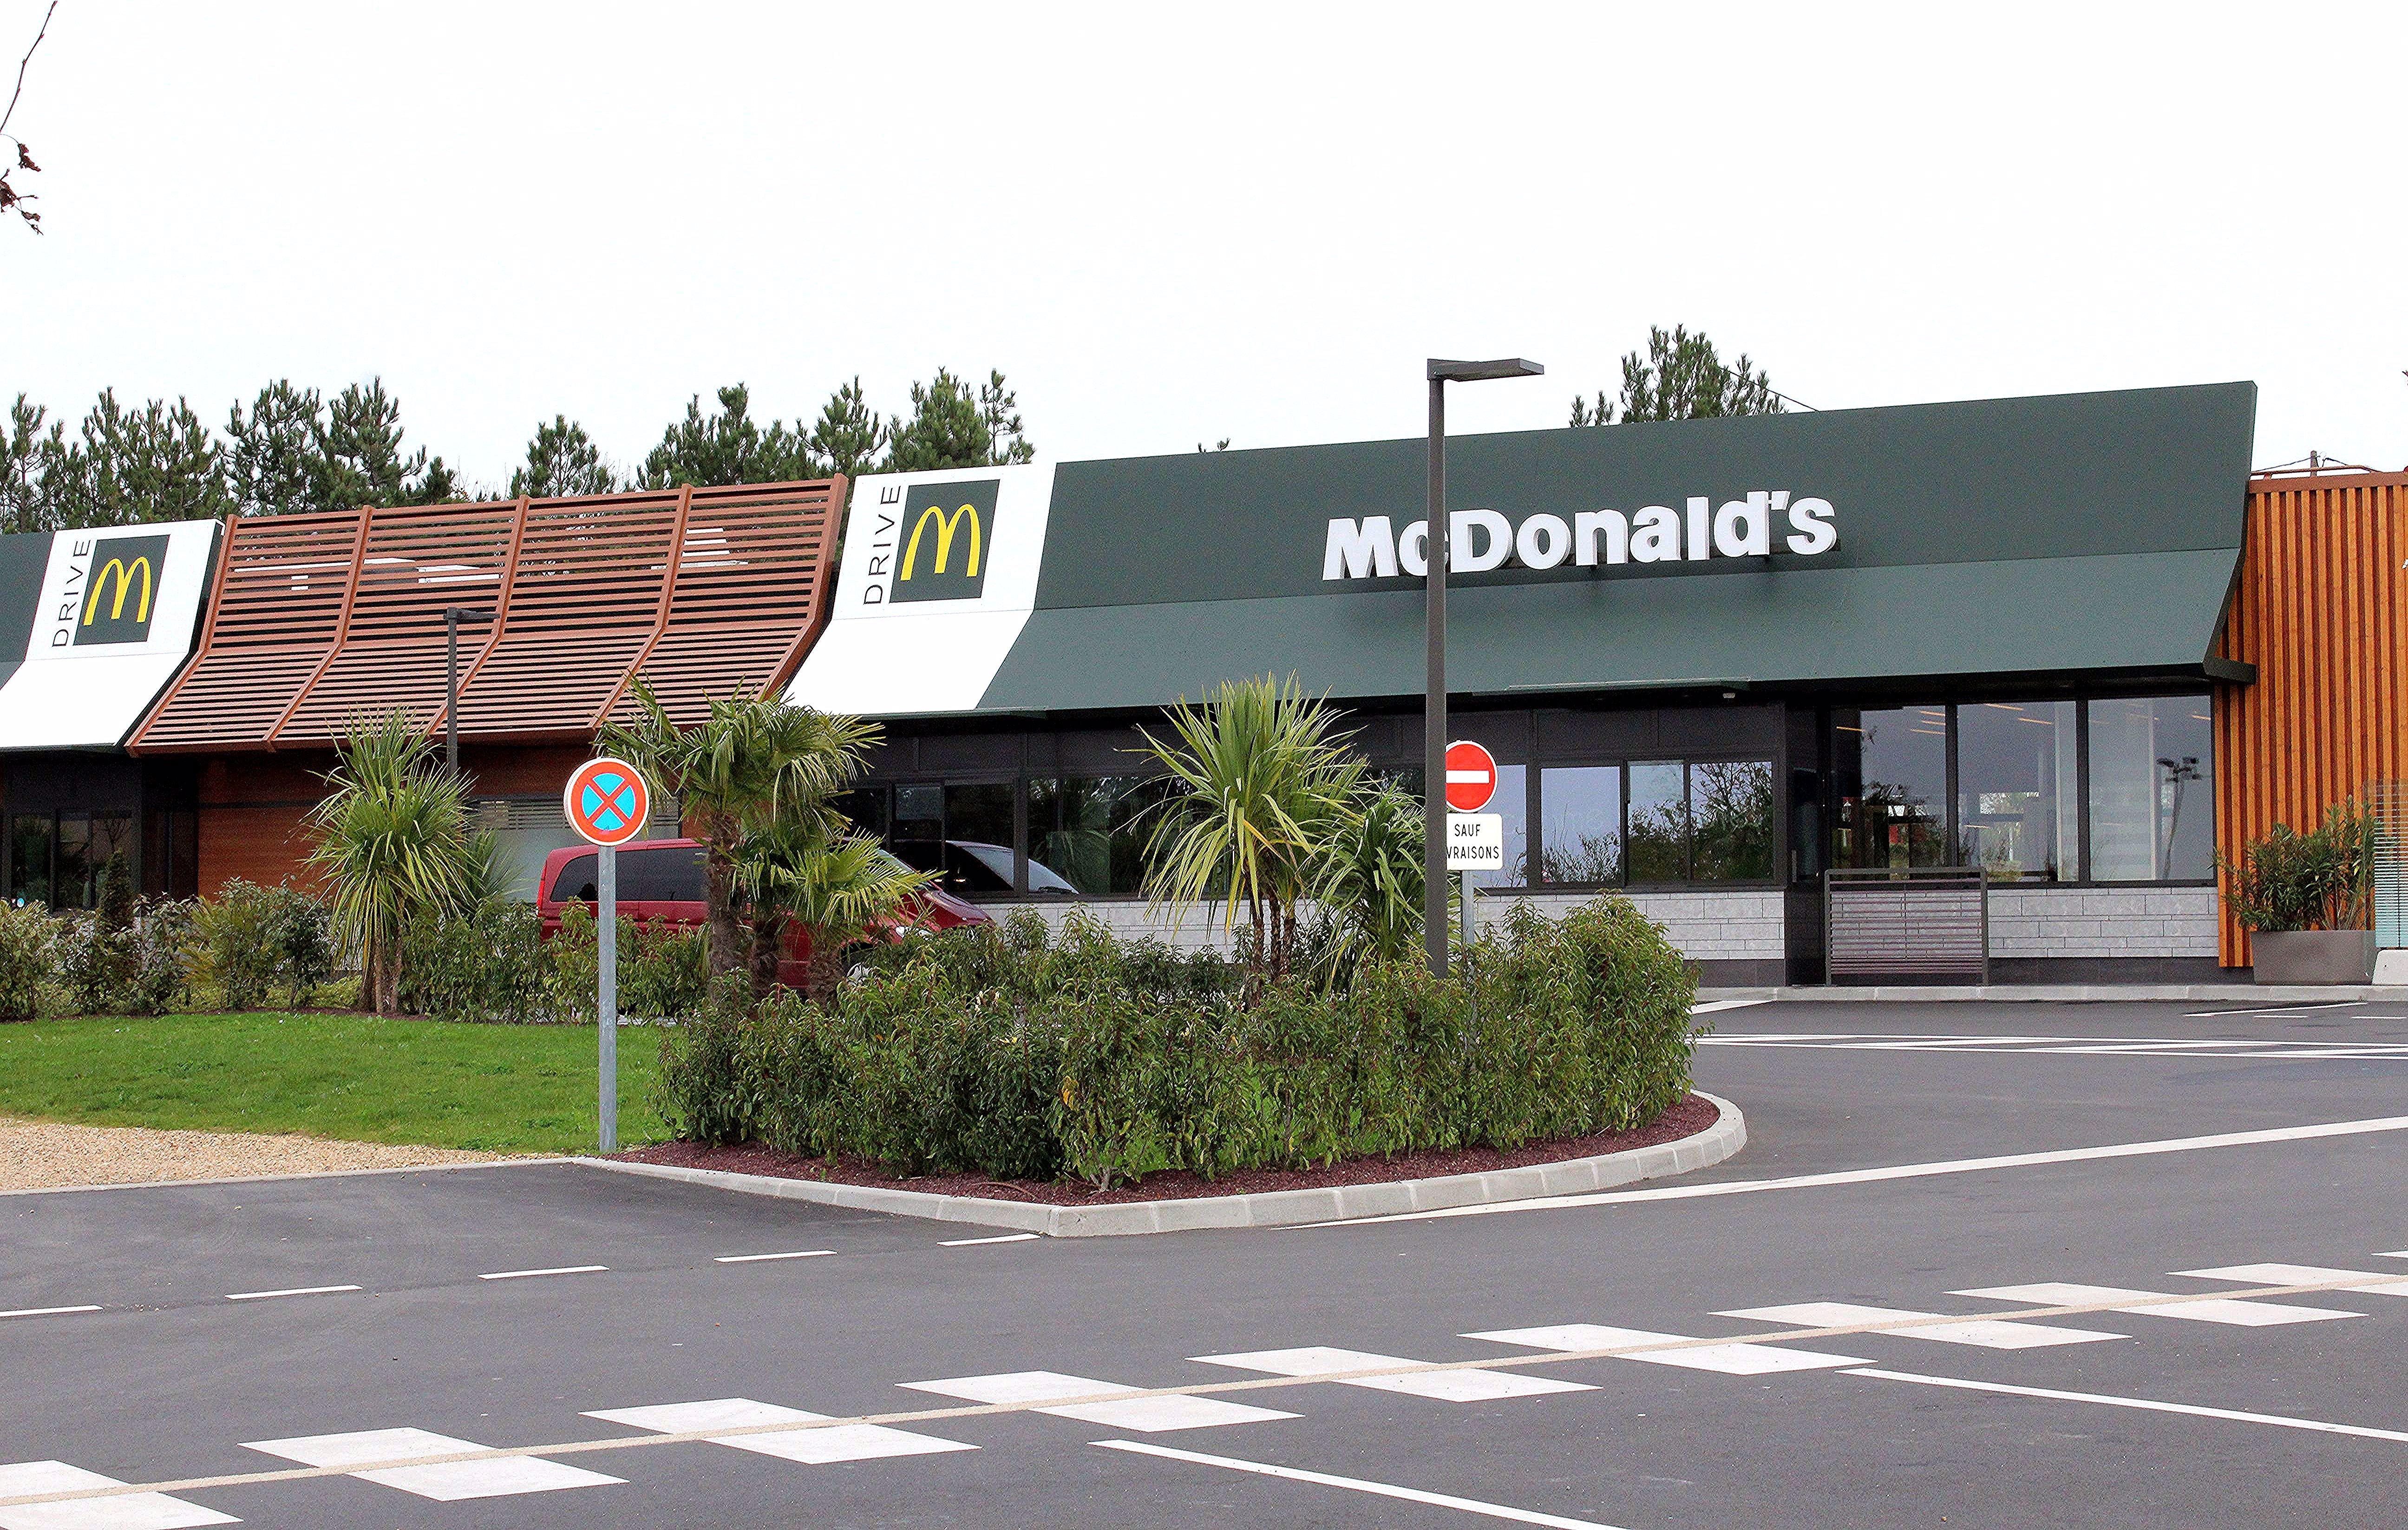 Restaurant Mcdonald S Restauration Rapide Ouvert Toute L Annee Outdoor Decor Decor Outdoor